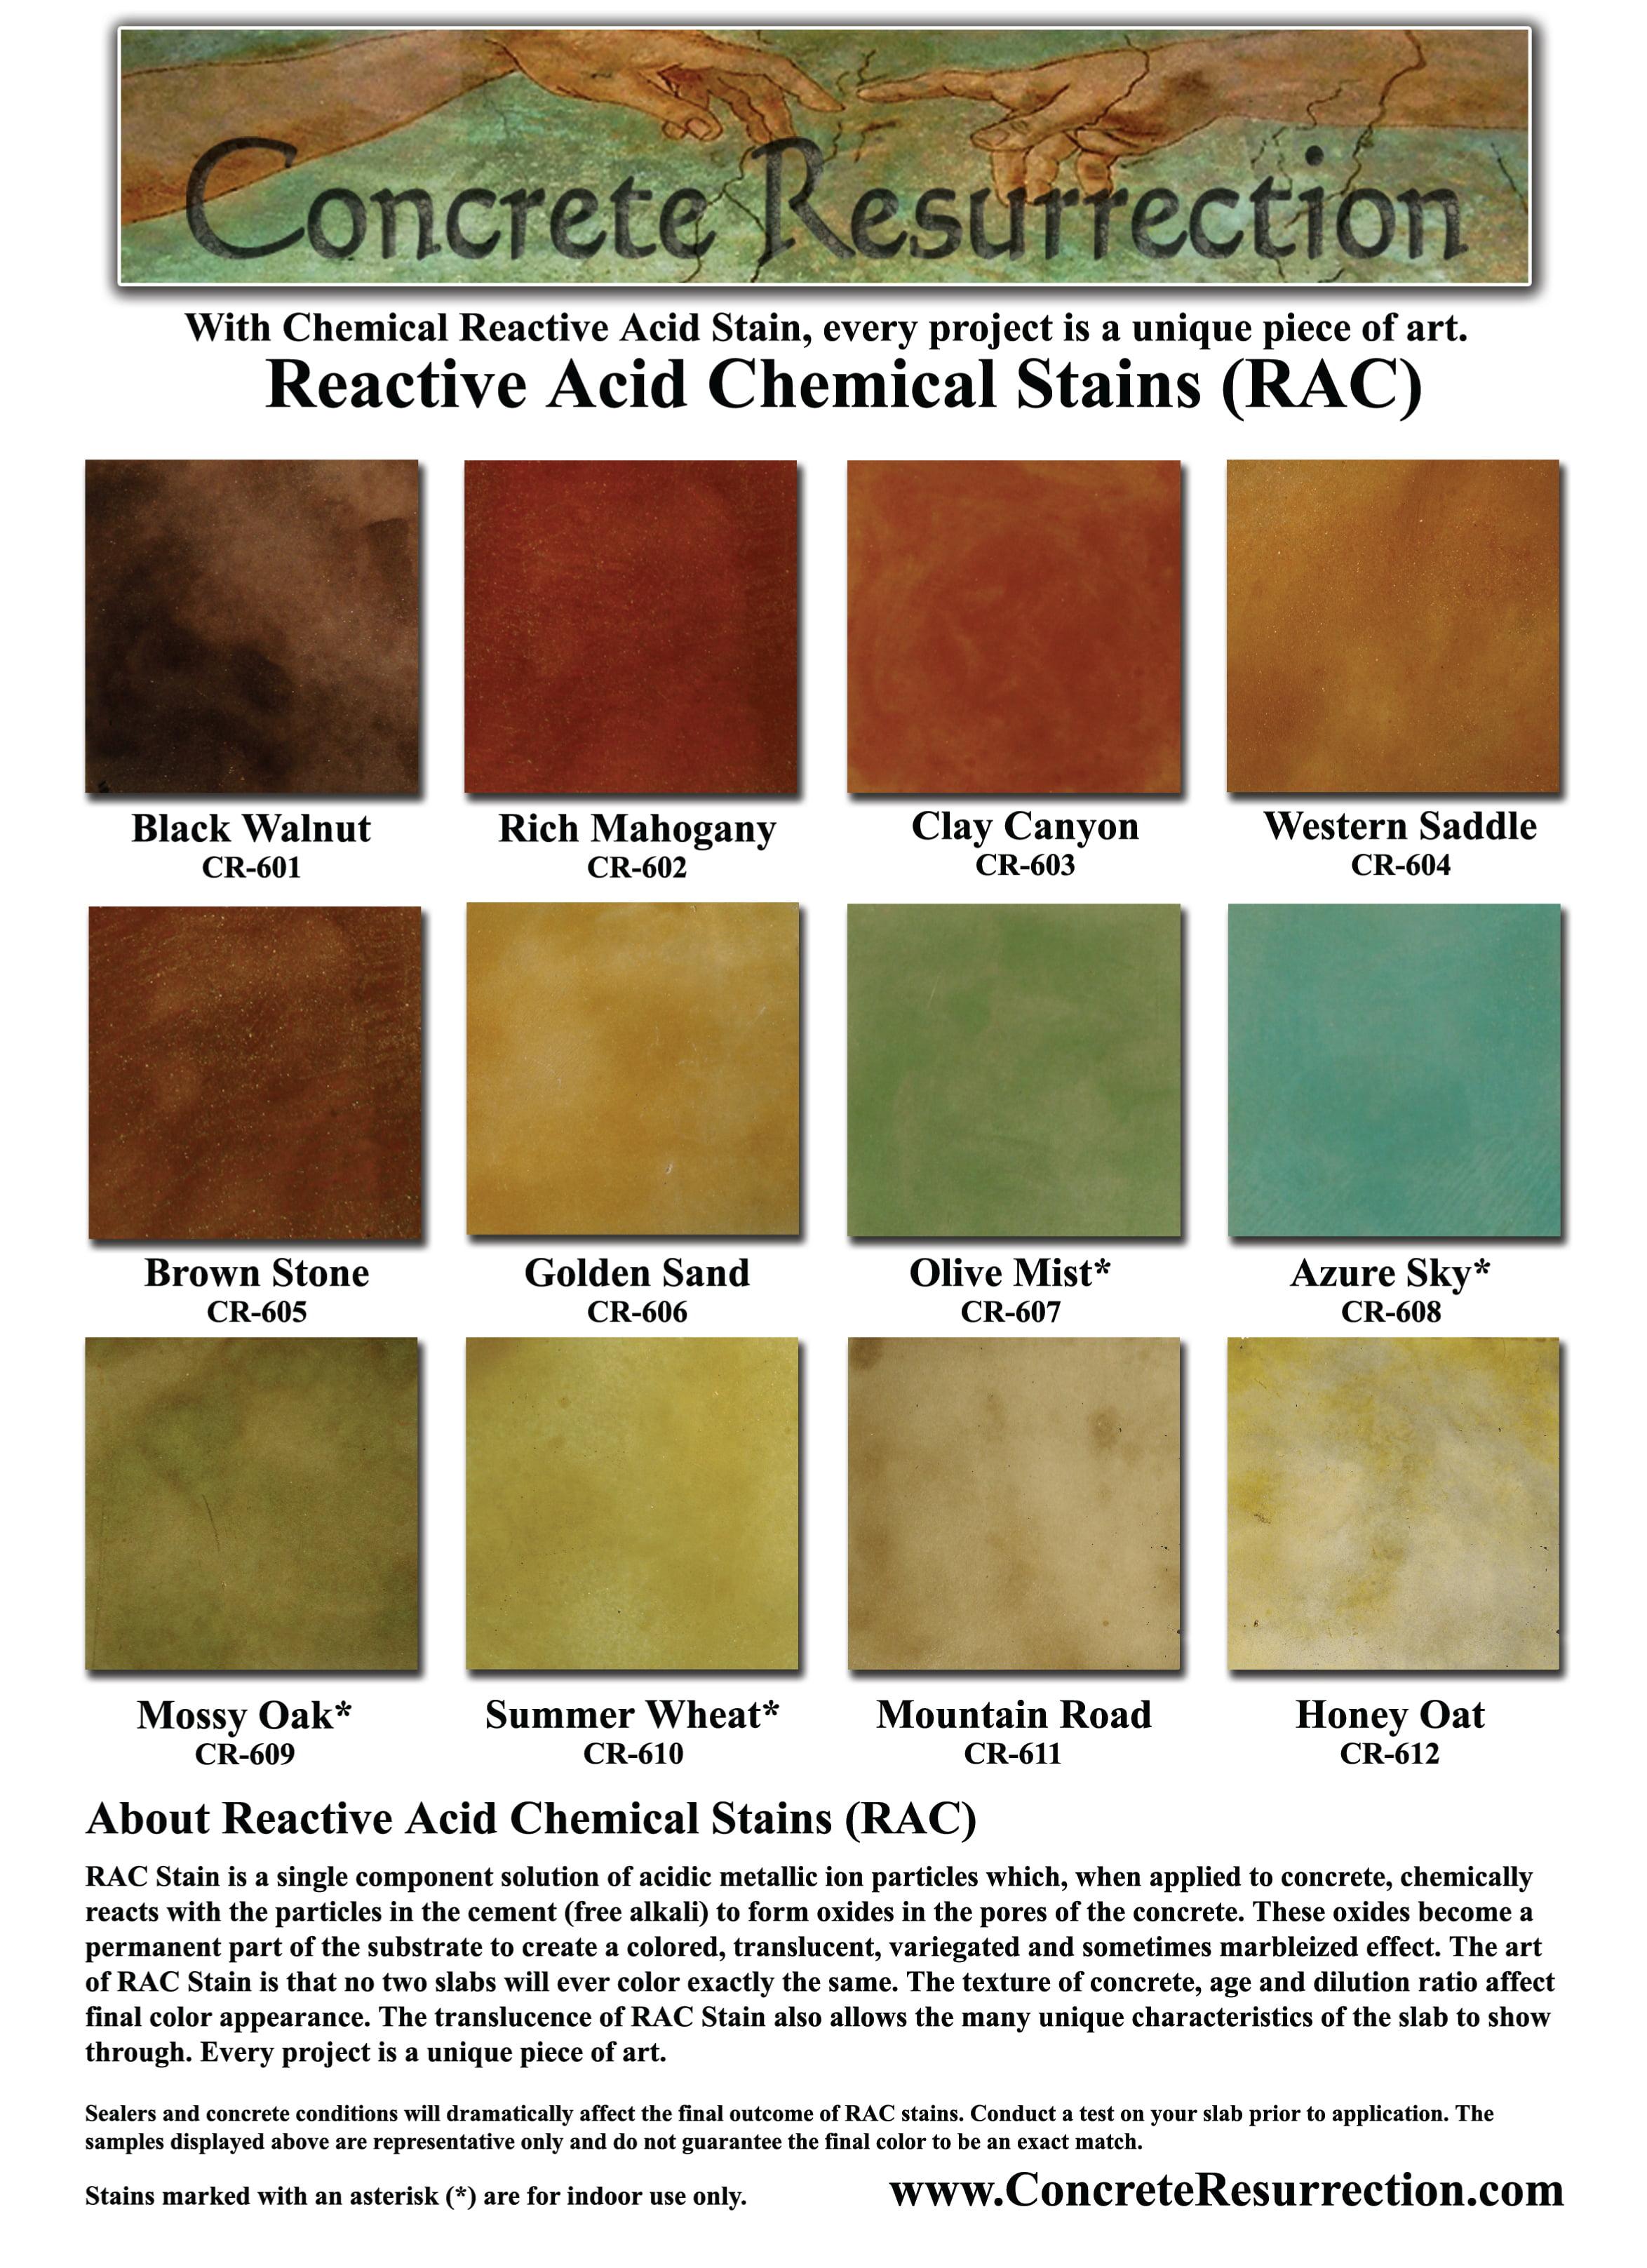 acid reactive concrete brown concrete brown resurrection stain stone